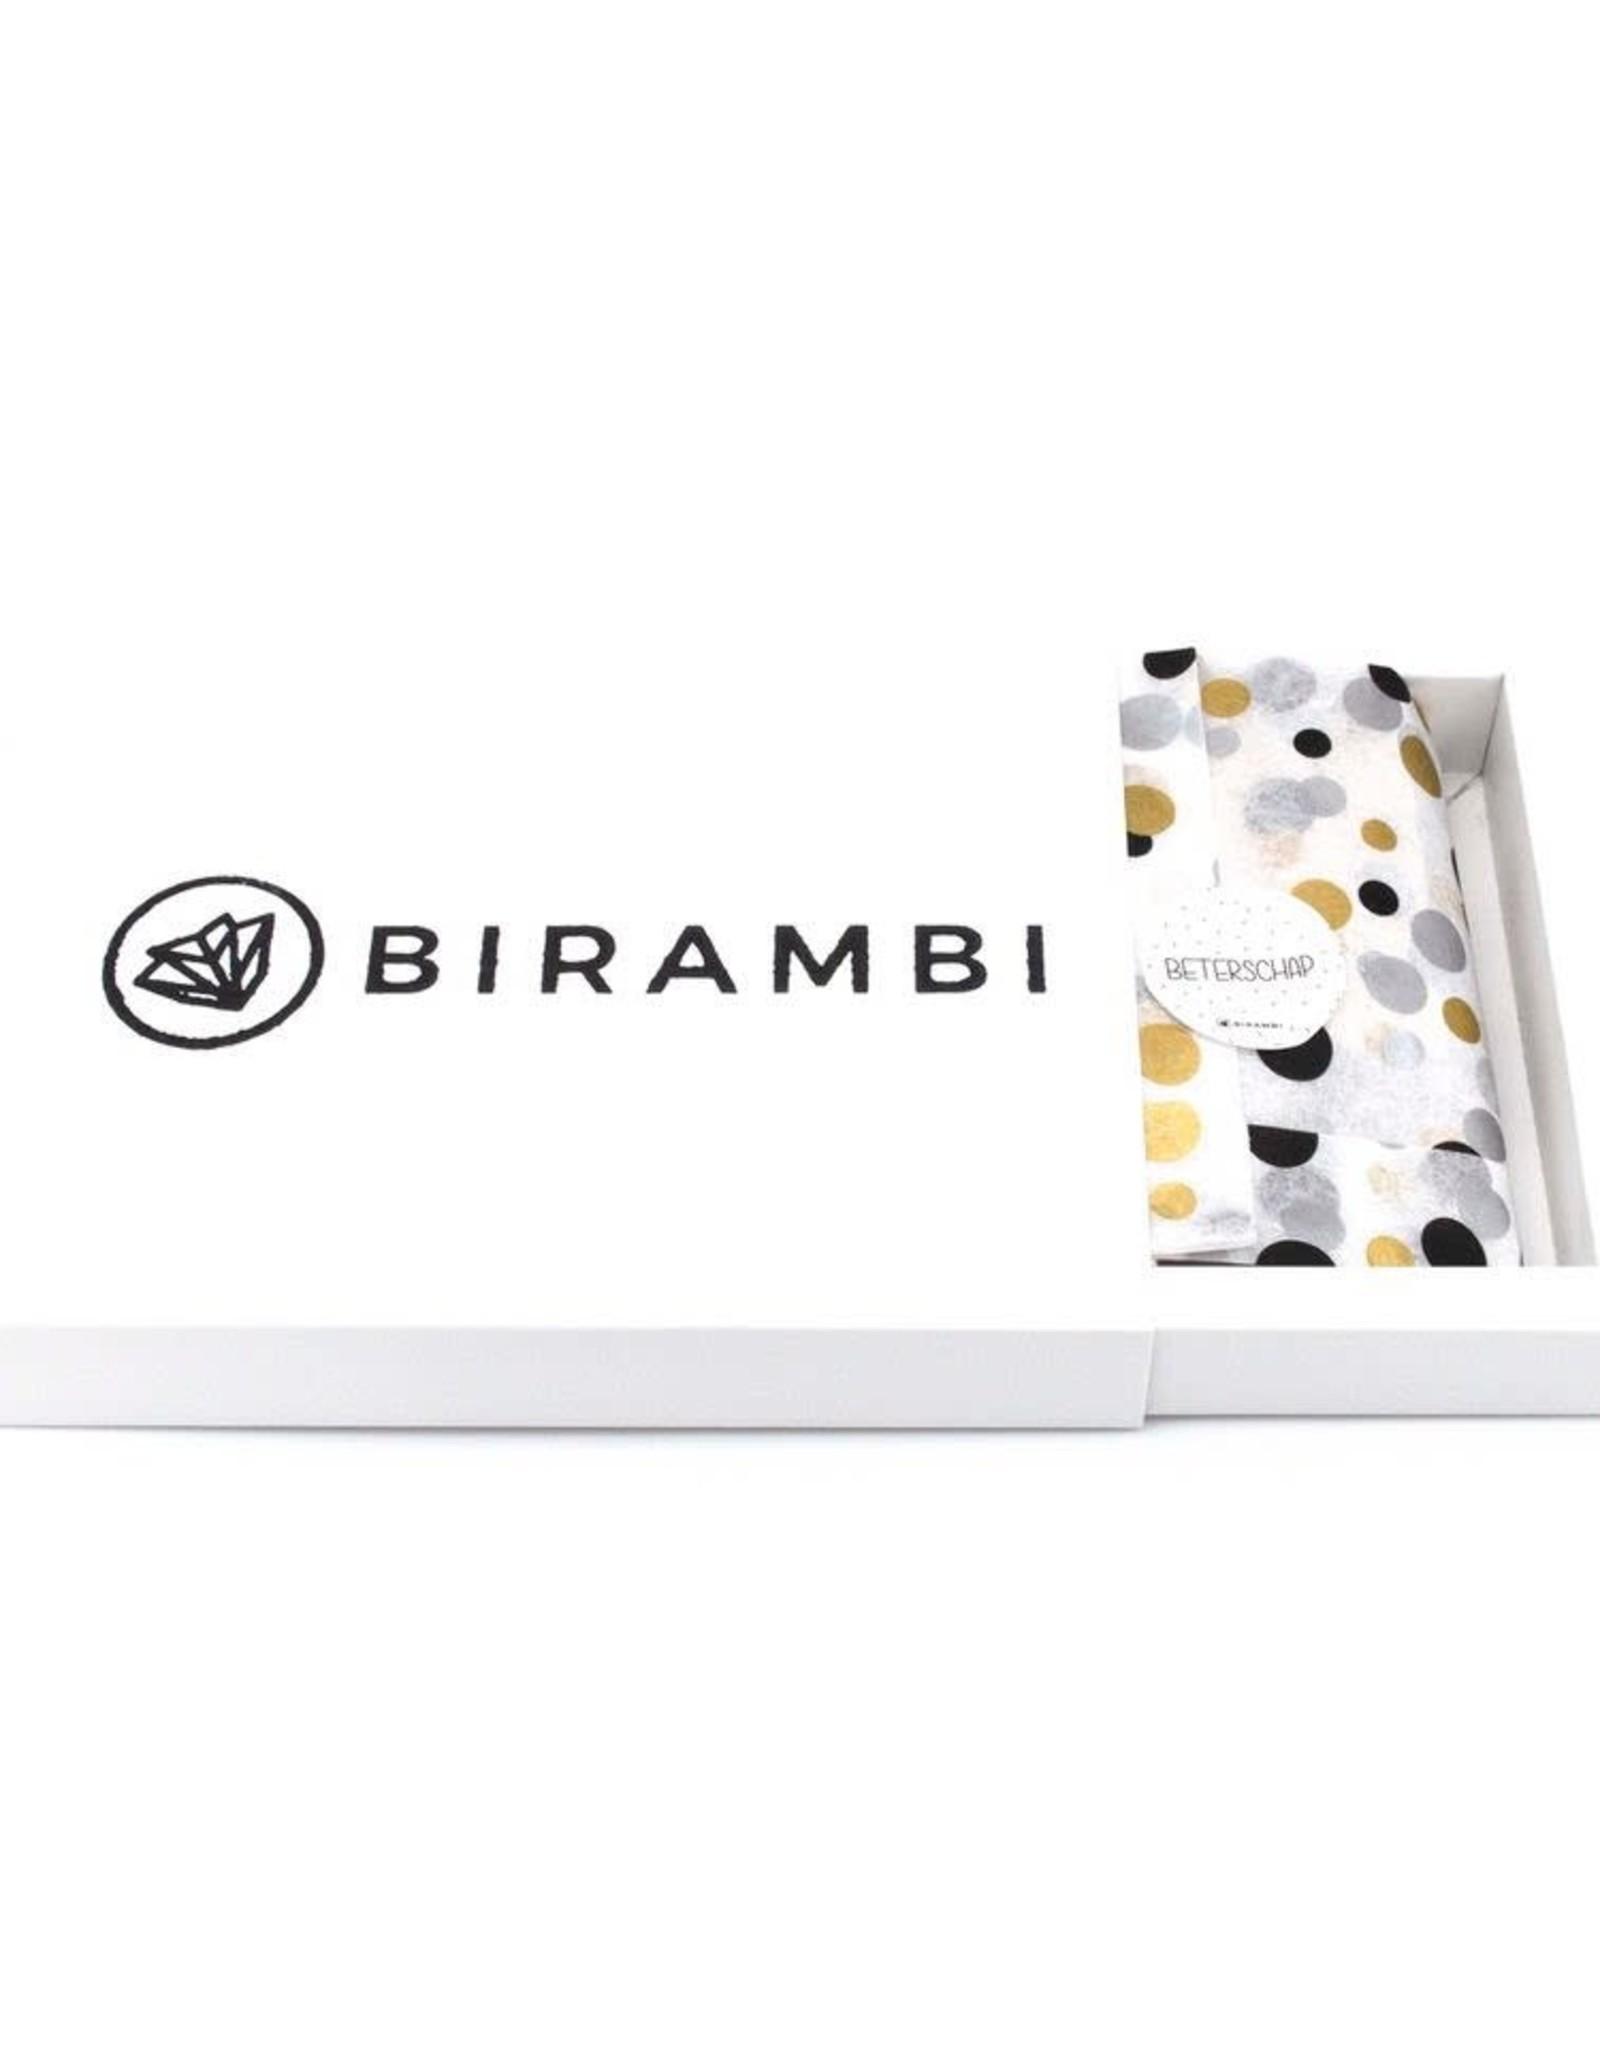 Birambi birambi get well soon giftset